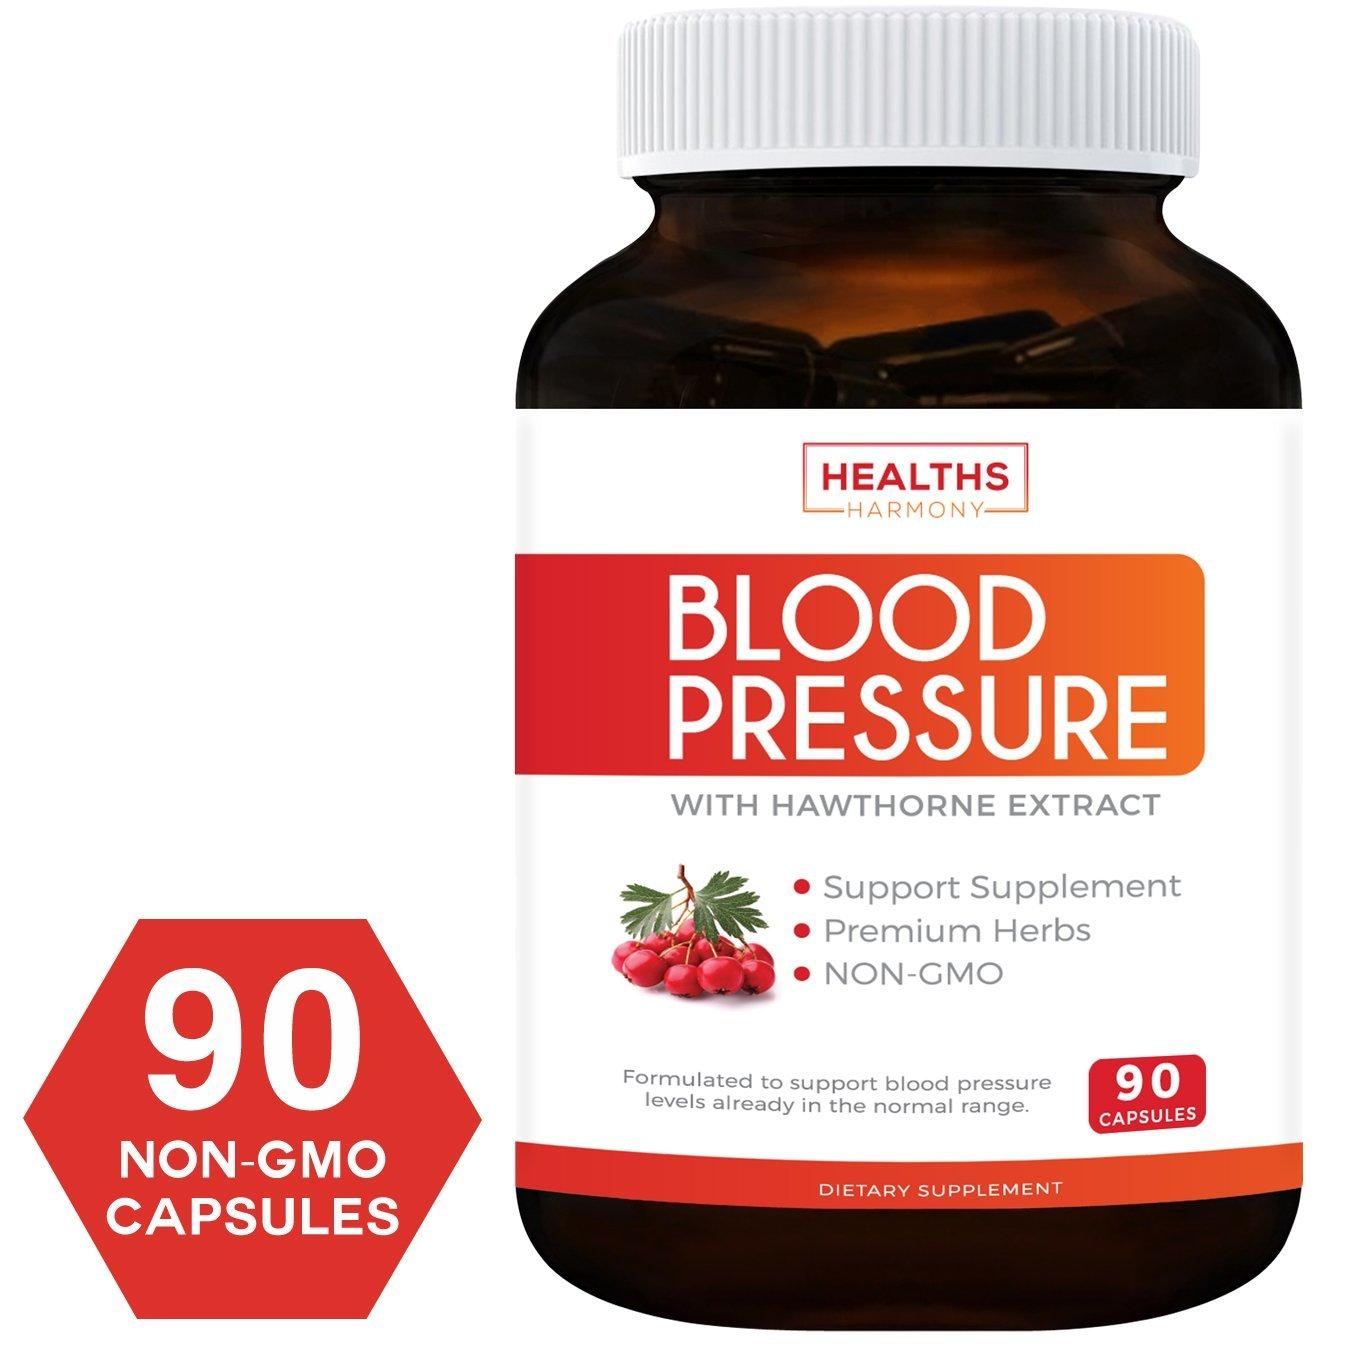 Blood Pressure Support Supplement (Non-GMO) – Premium Natural Herbs, Vitamins & Berries – High Dosage of Hawthorn…